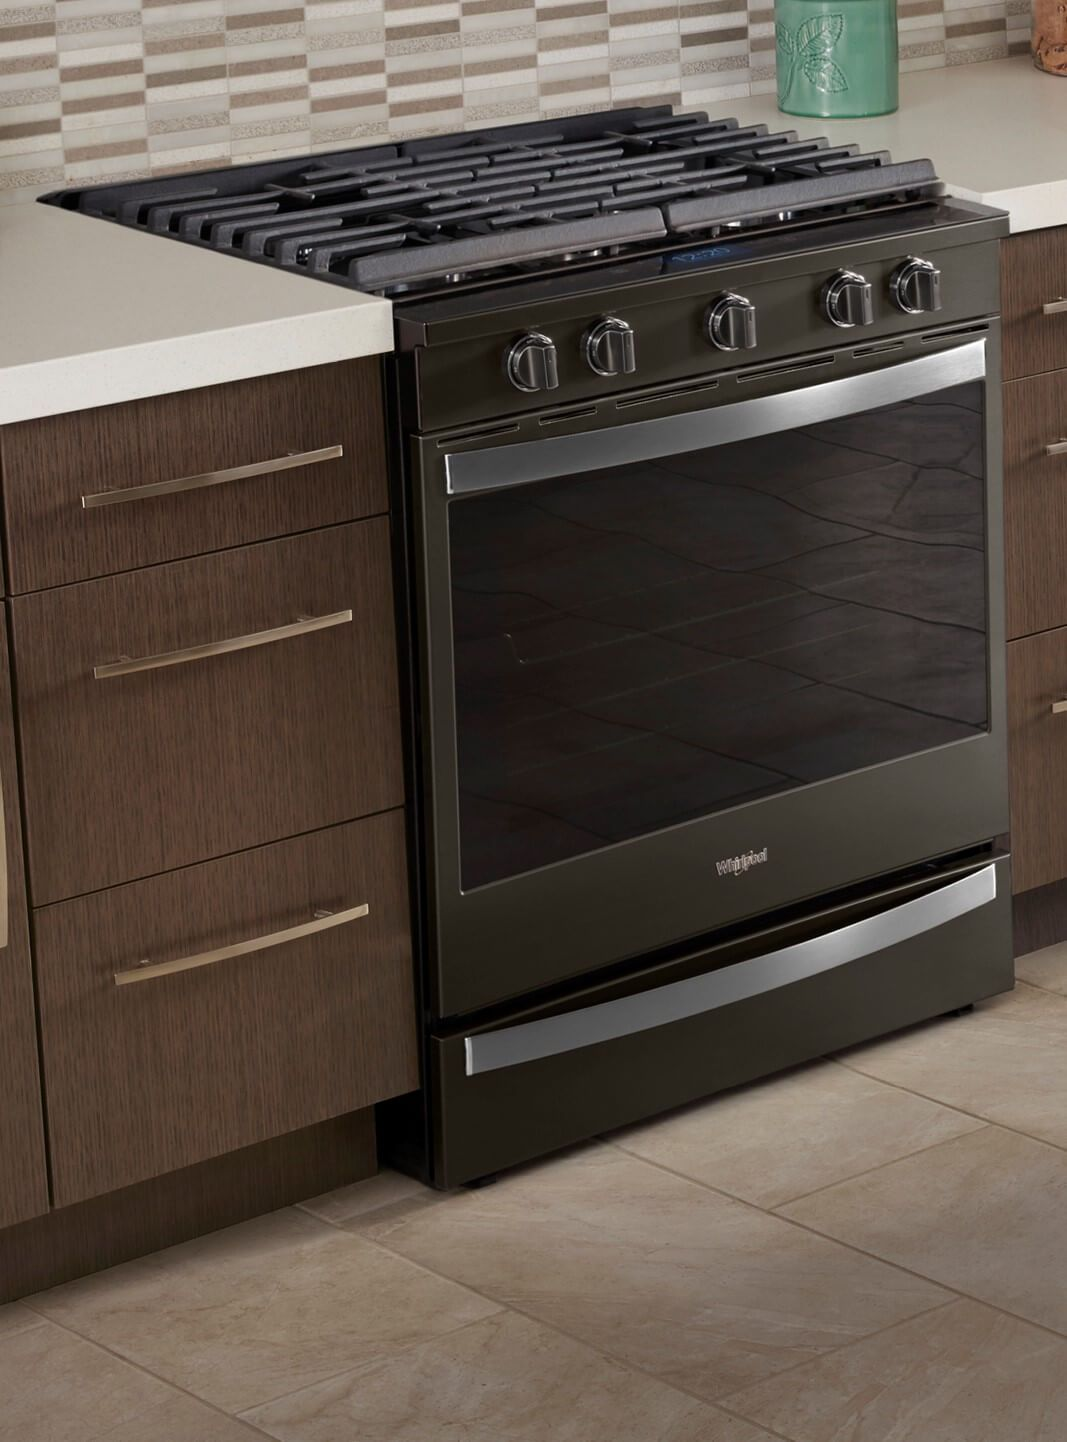 Whirlpool® kitchen range